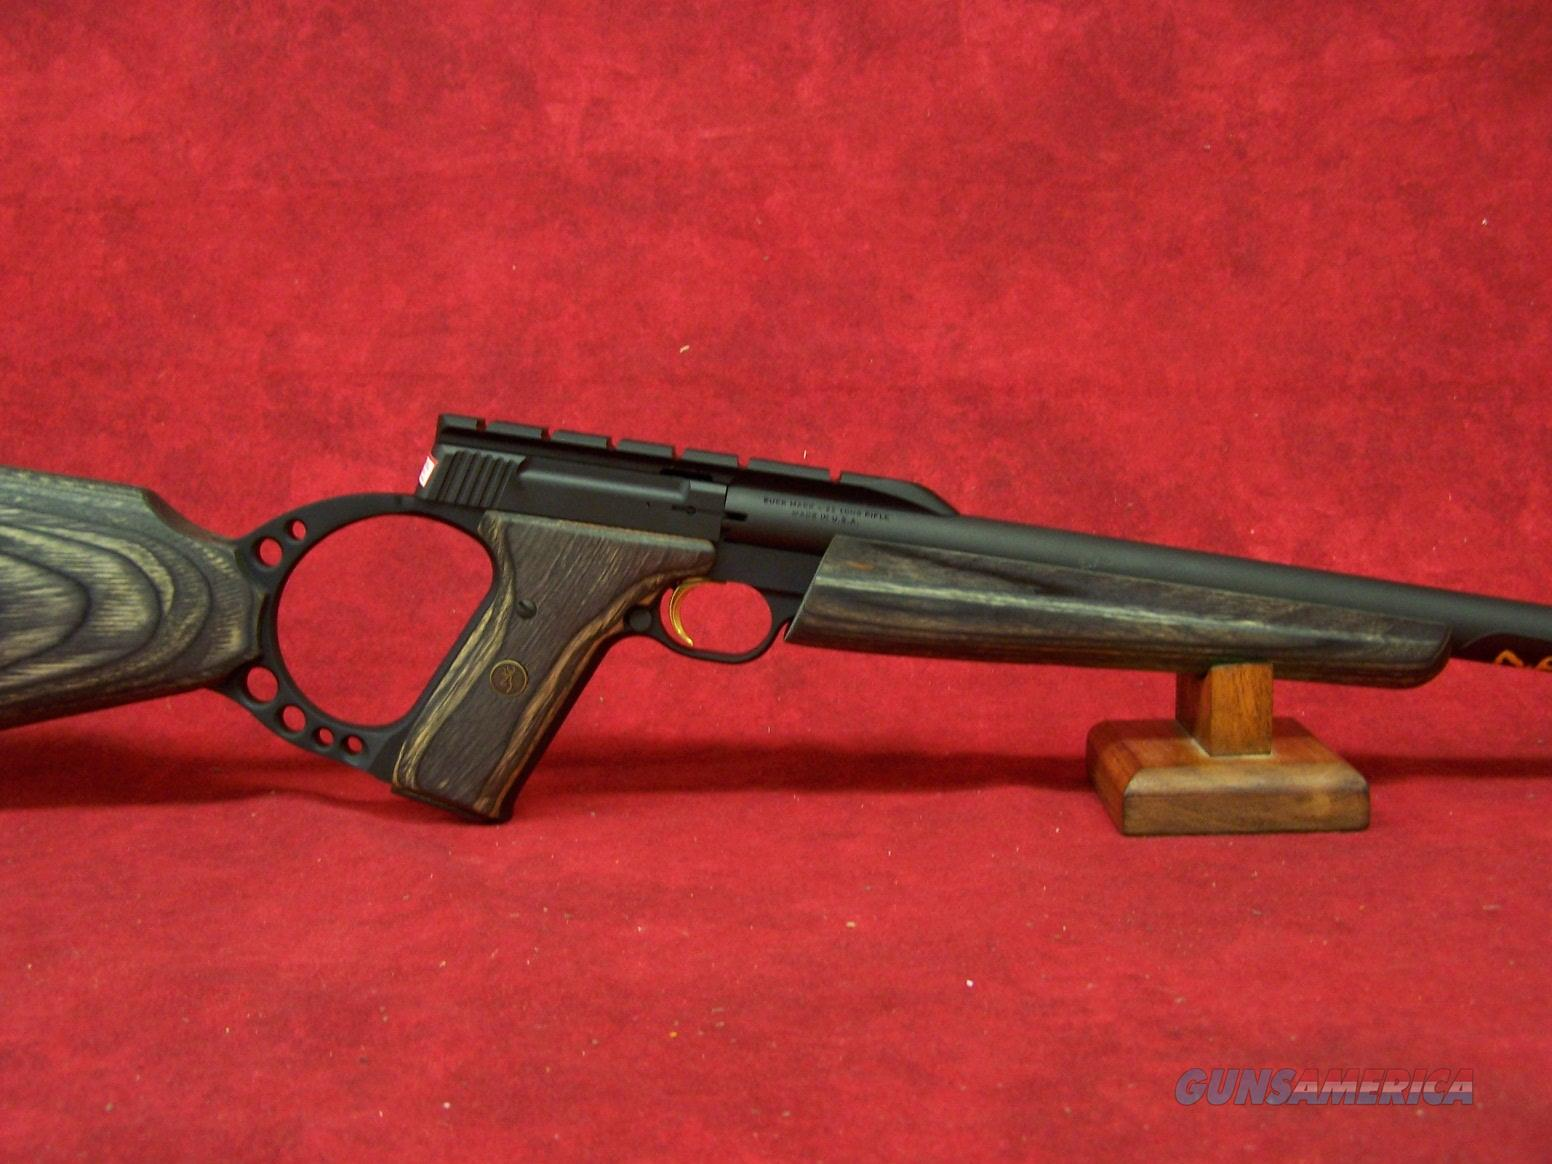 Browning Buck Mark Rifle Target Gray Laminate .22 LR (021030202)  Guns > Rifles > Browning Rifles > Semi Auto > Hunting